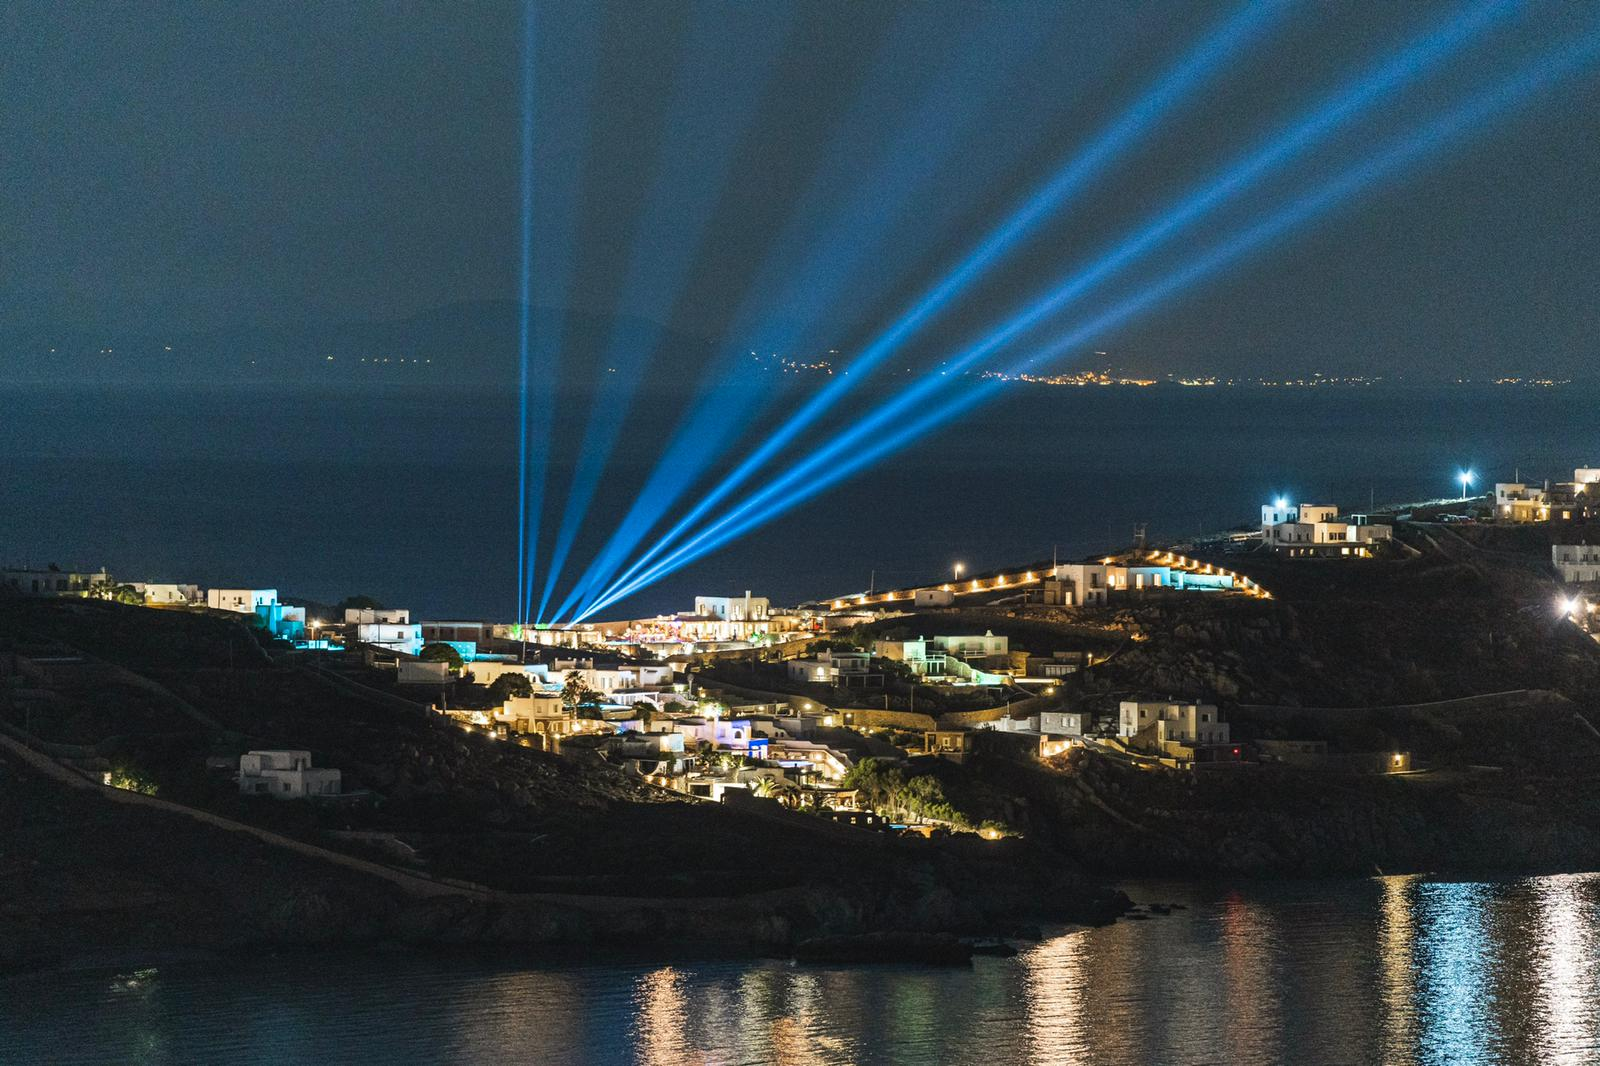 Lighting rental Mykonos, Dj Services